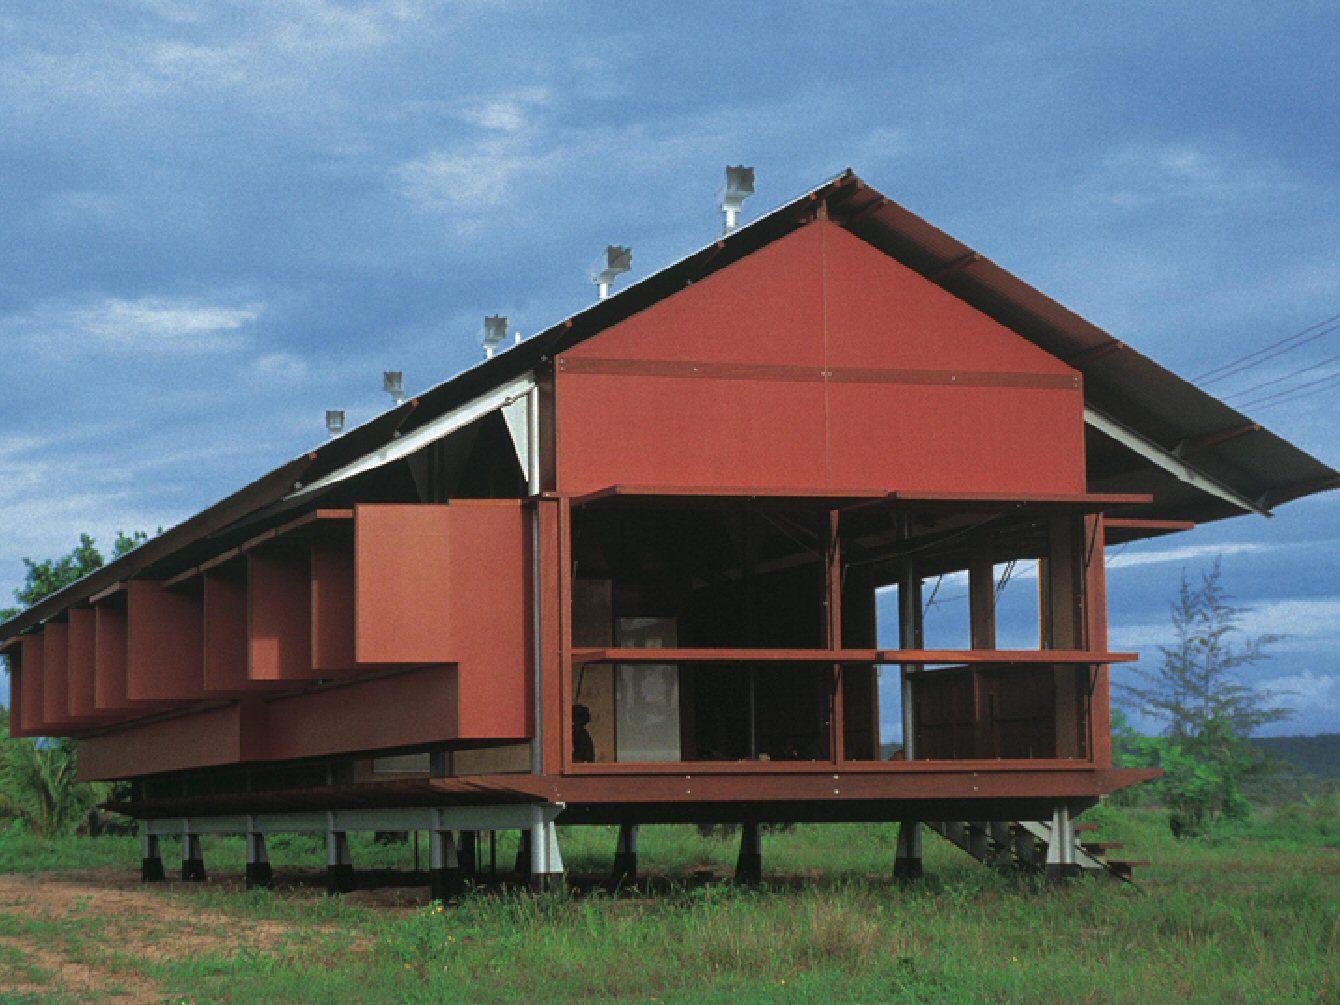 cottage tropical home decorating ideas.htm an australia house cool design by glenn murcutt  cool design by glenn murcutt